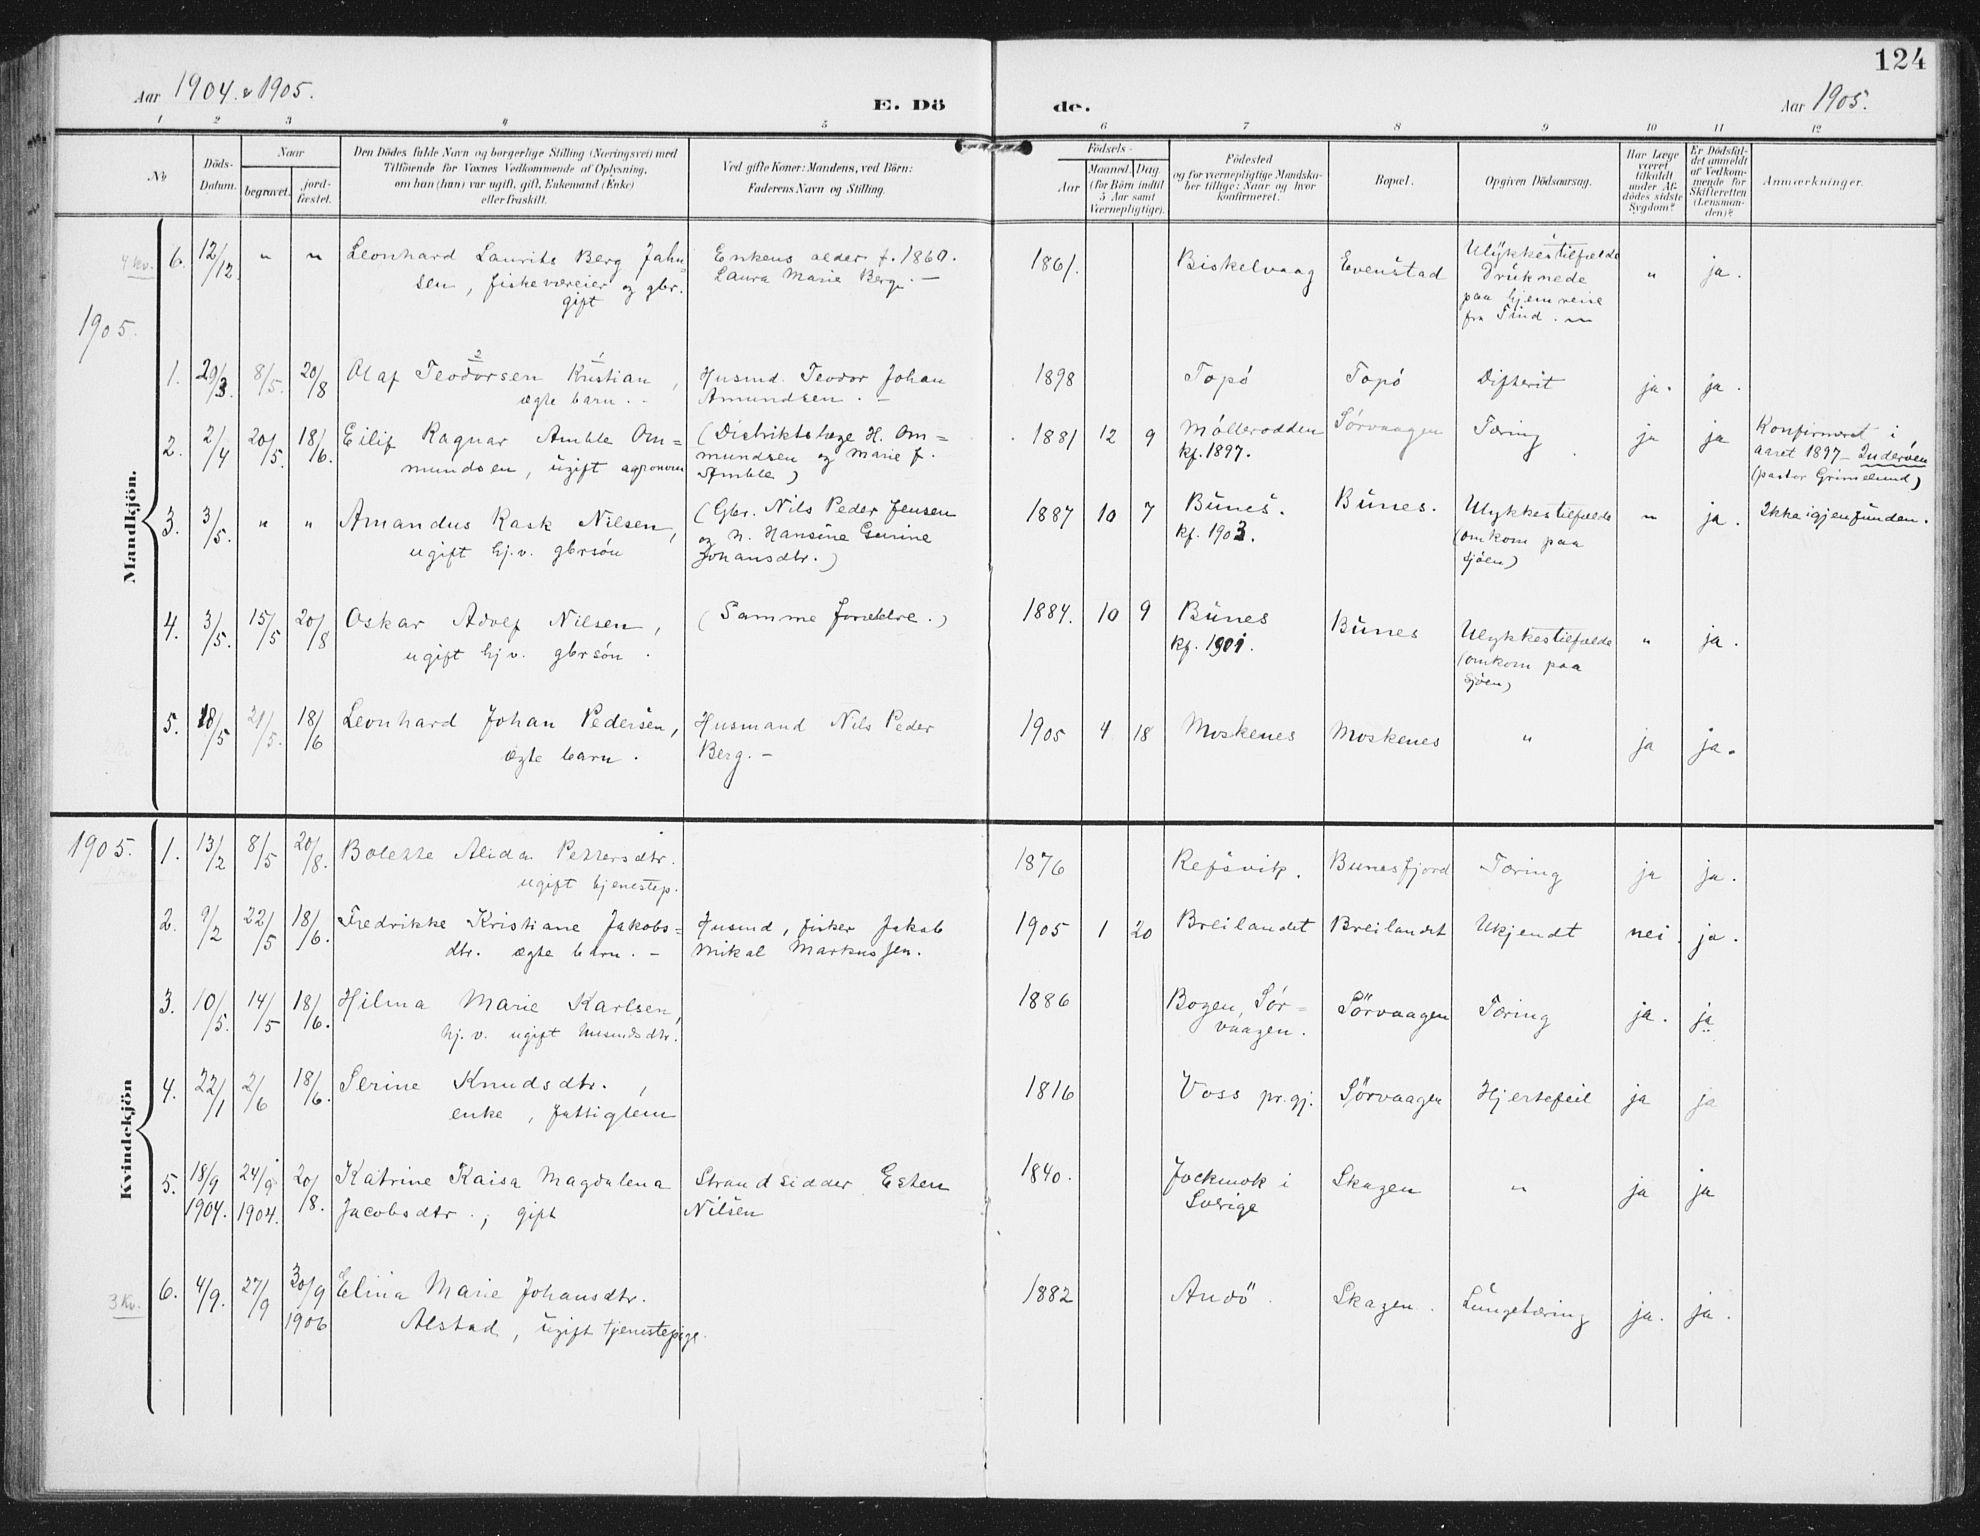 SAT, Ministerialprotokoller, klokkerbøker og fødselsregistre - Nordland, 886/L1221: Ministerialbok nr. 886A03, 1903-1913, s. 124